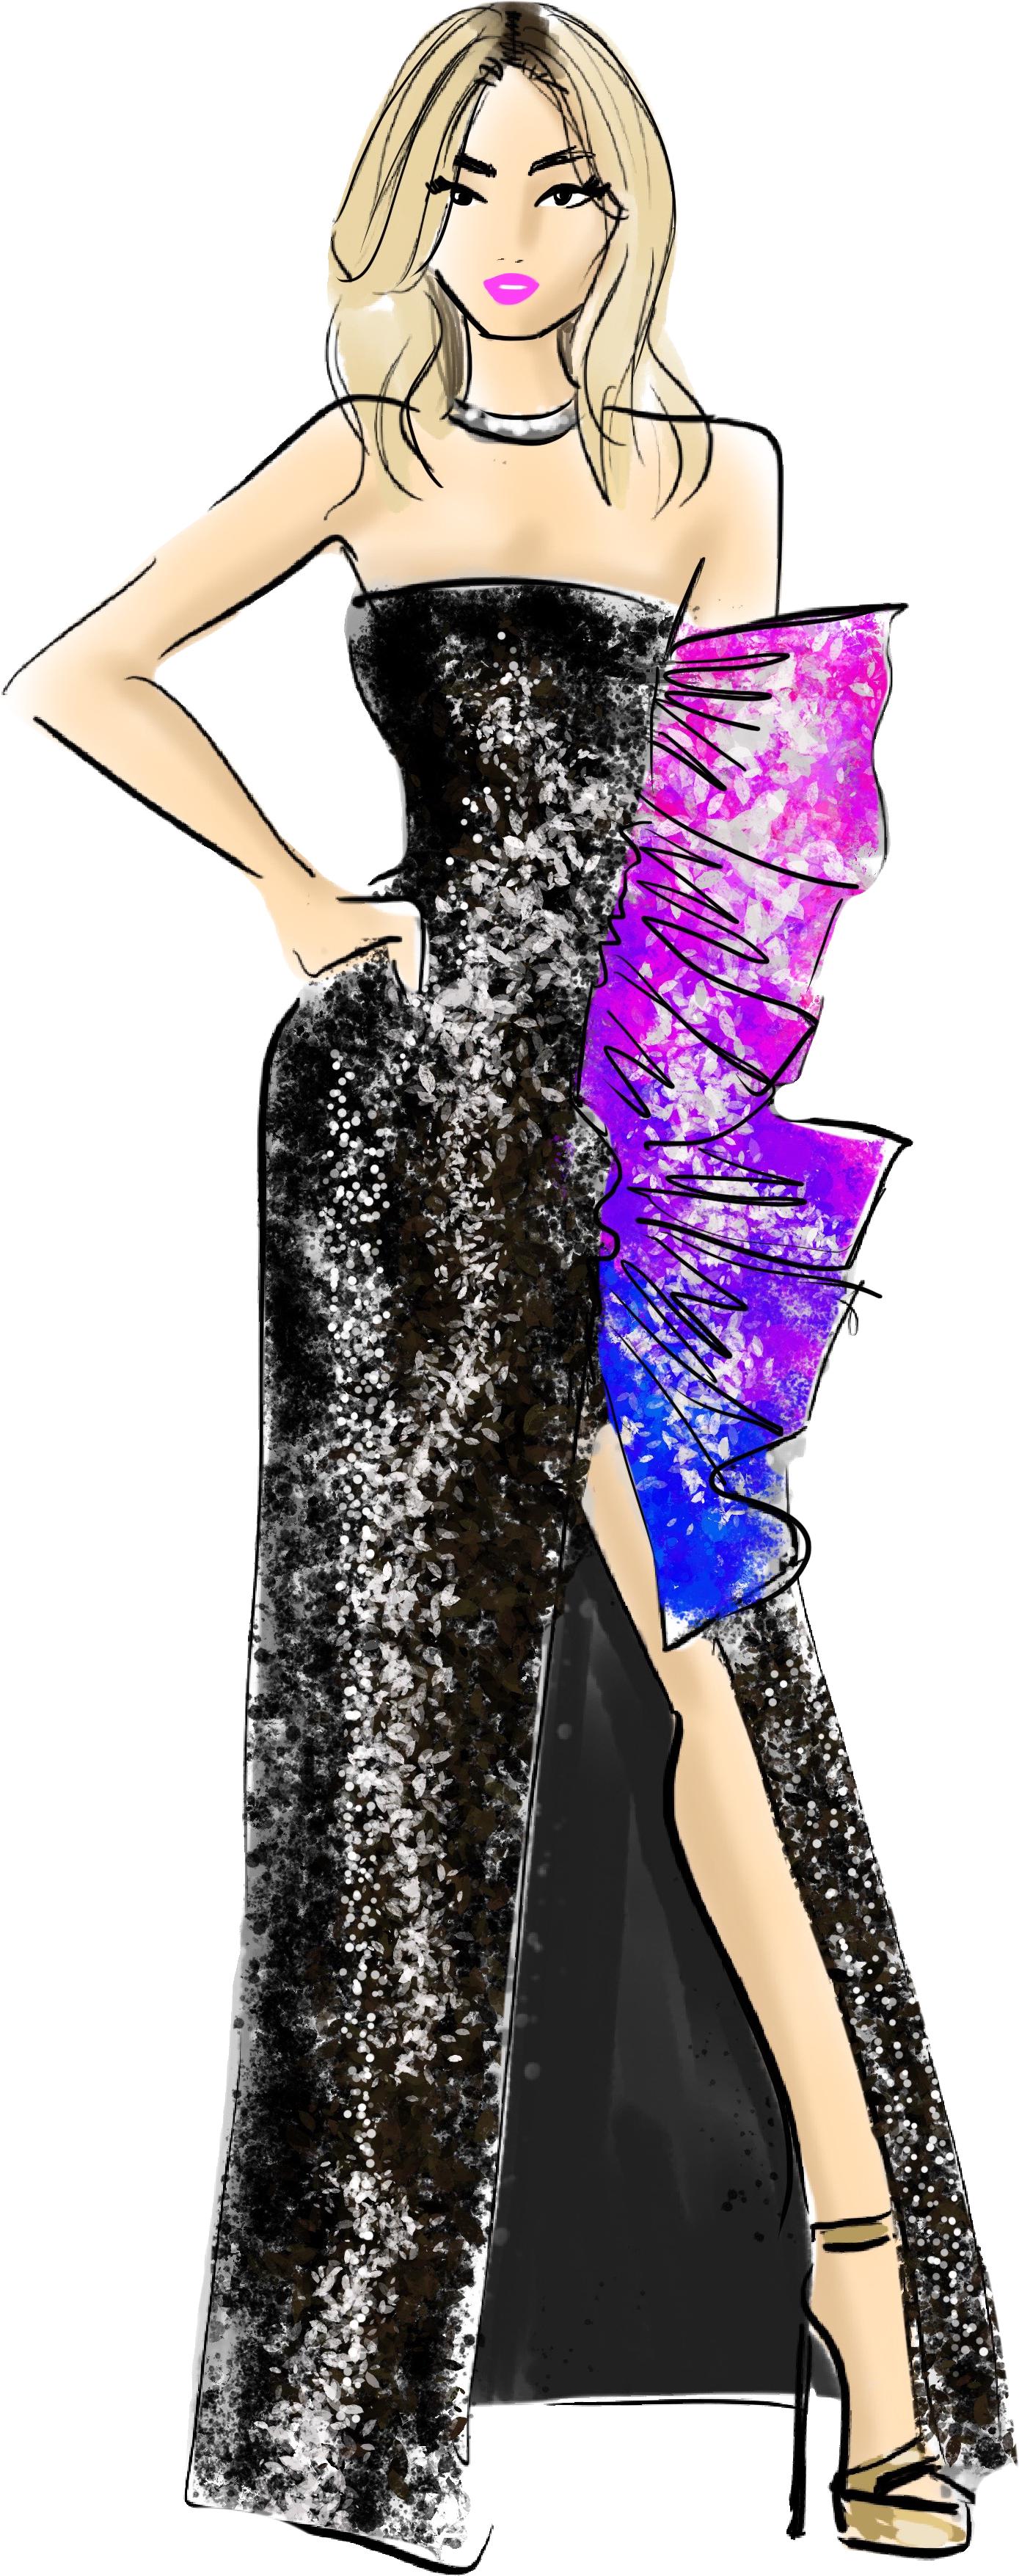 Single woman Fashion Illustrations